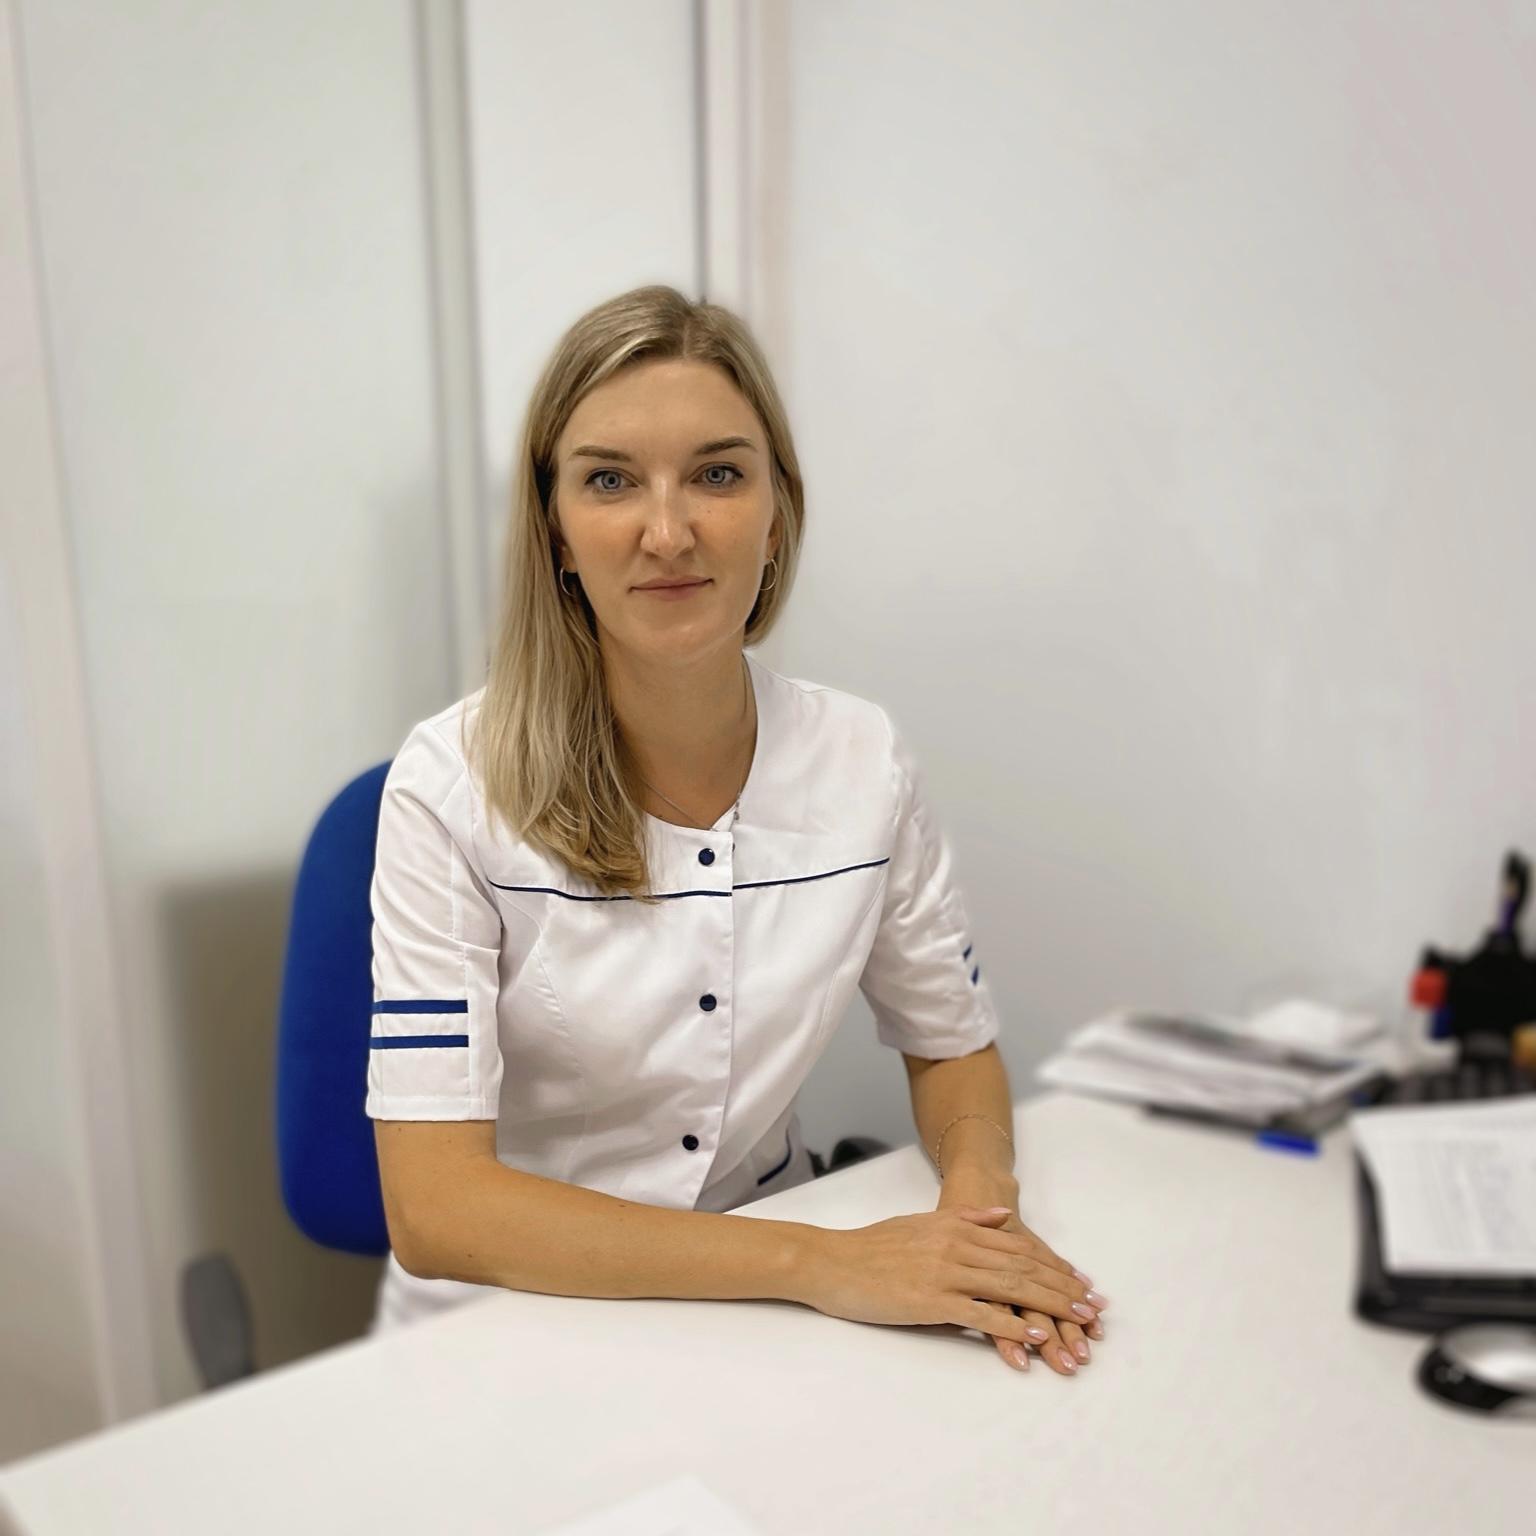 Кутинова Елена гинеколог Иваново